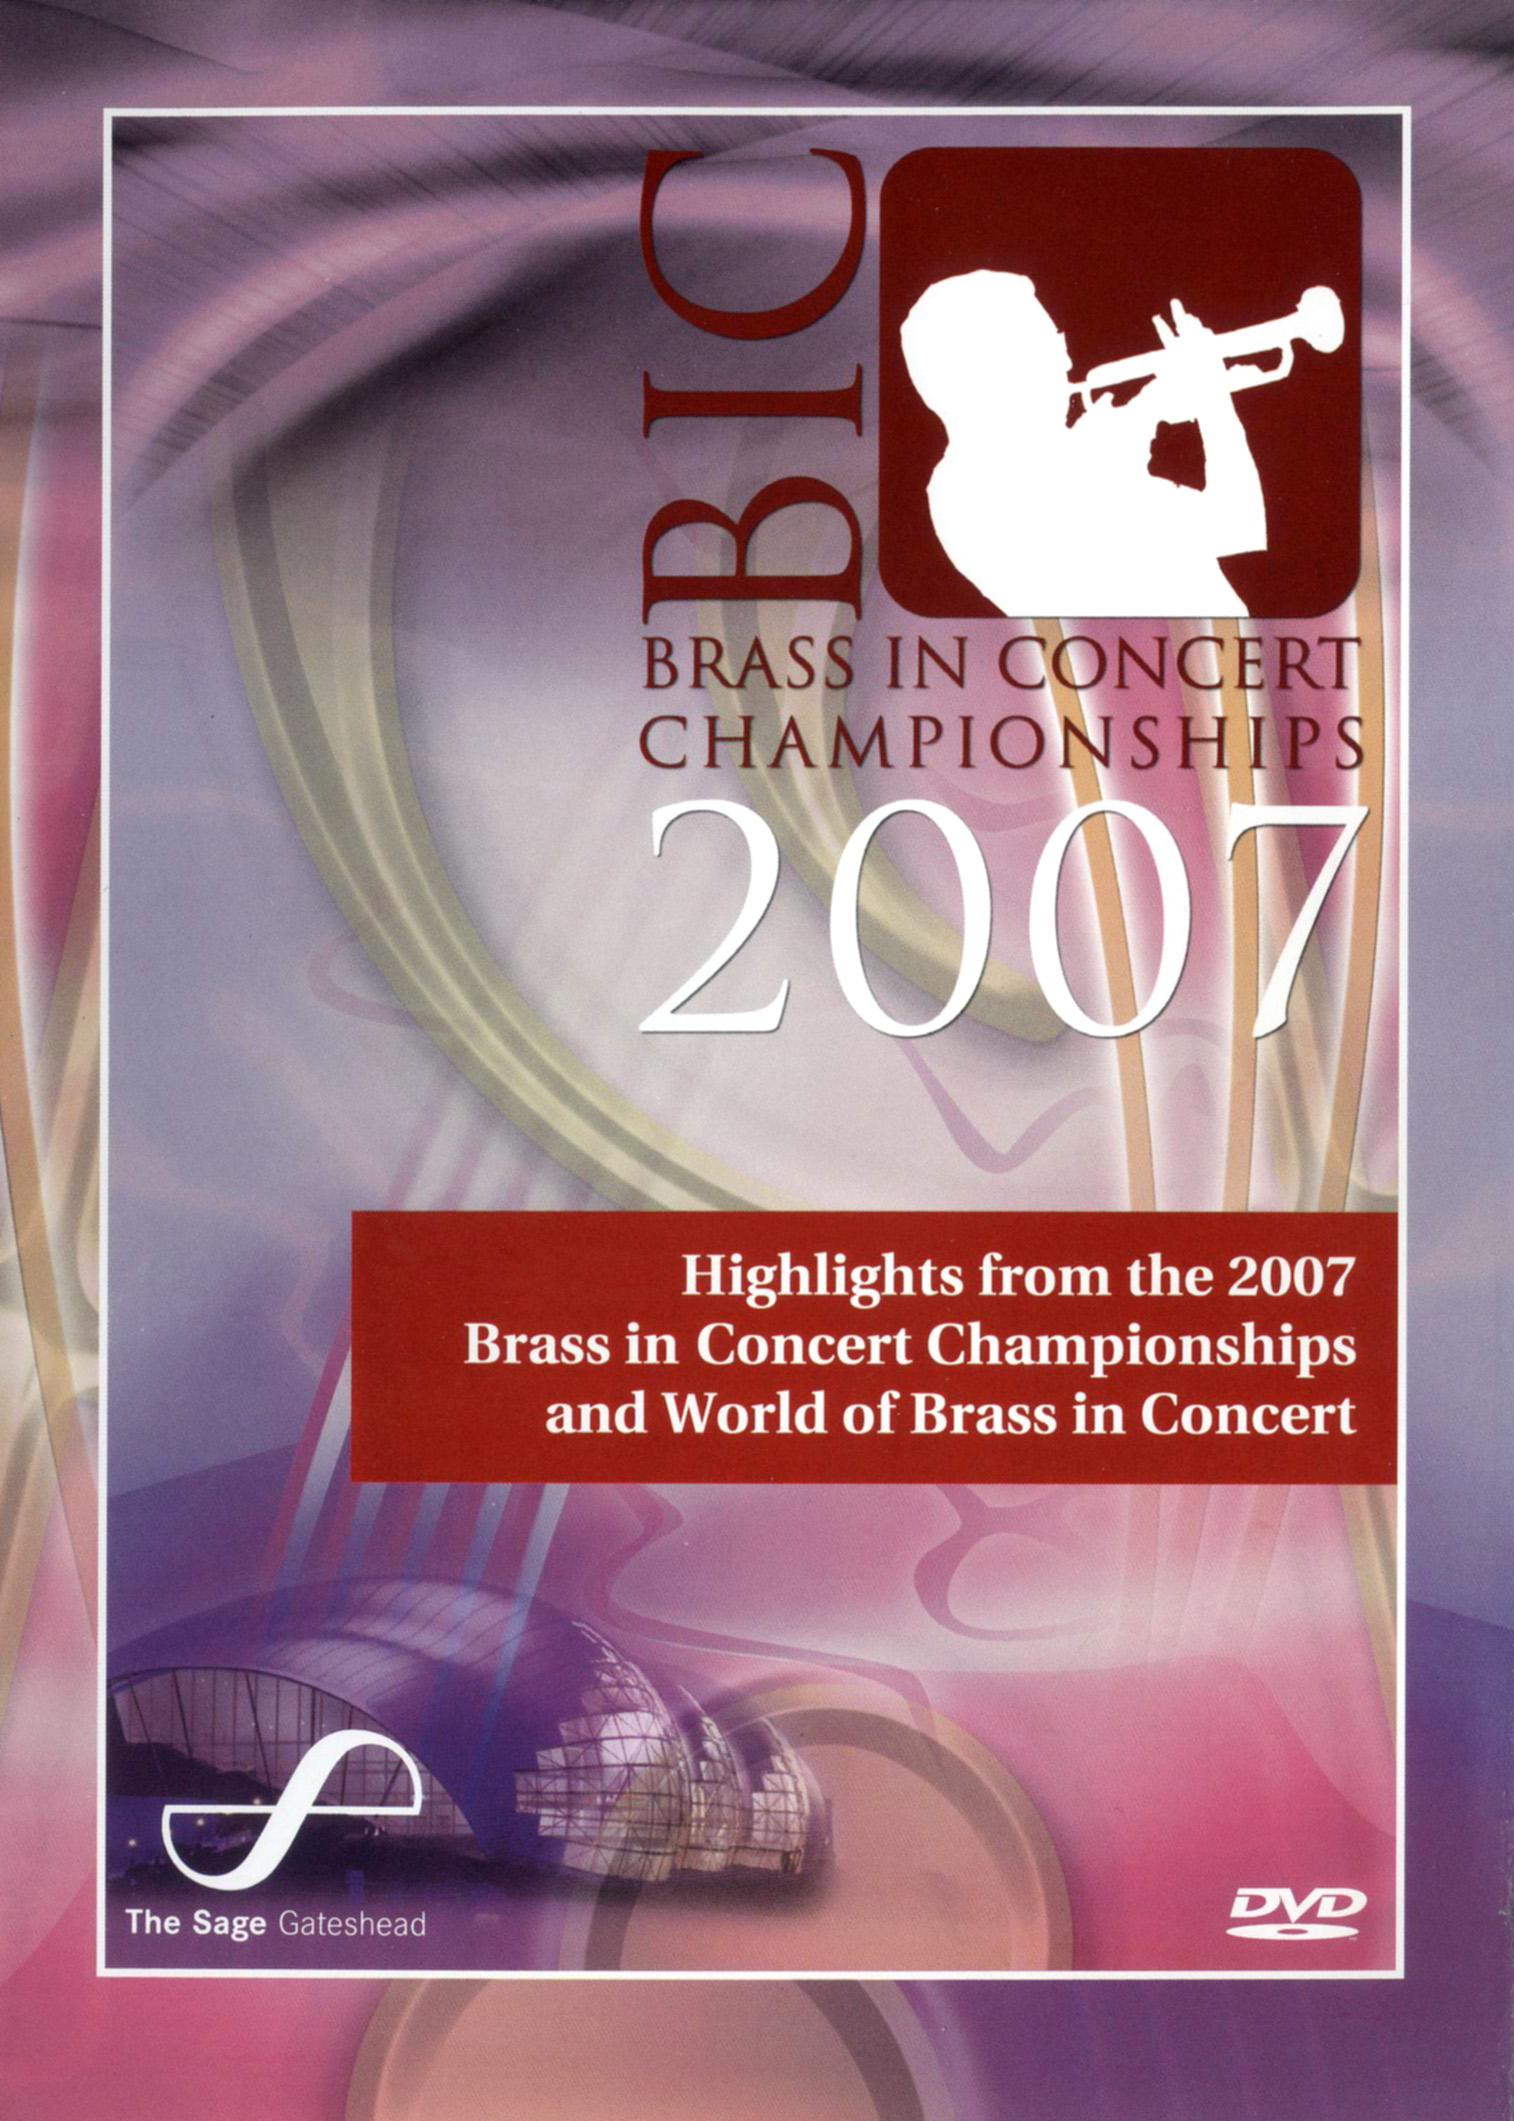 BIC - Brass in Concert Championships 2007